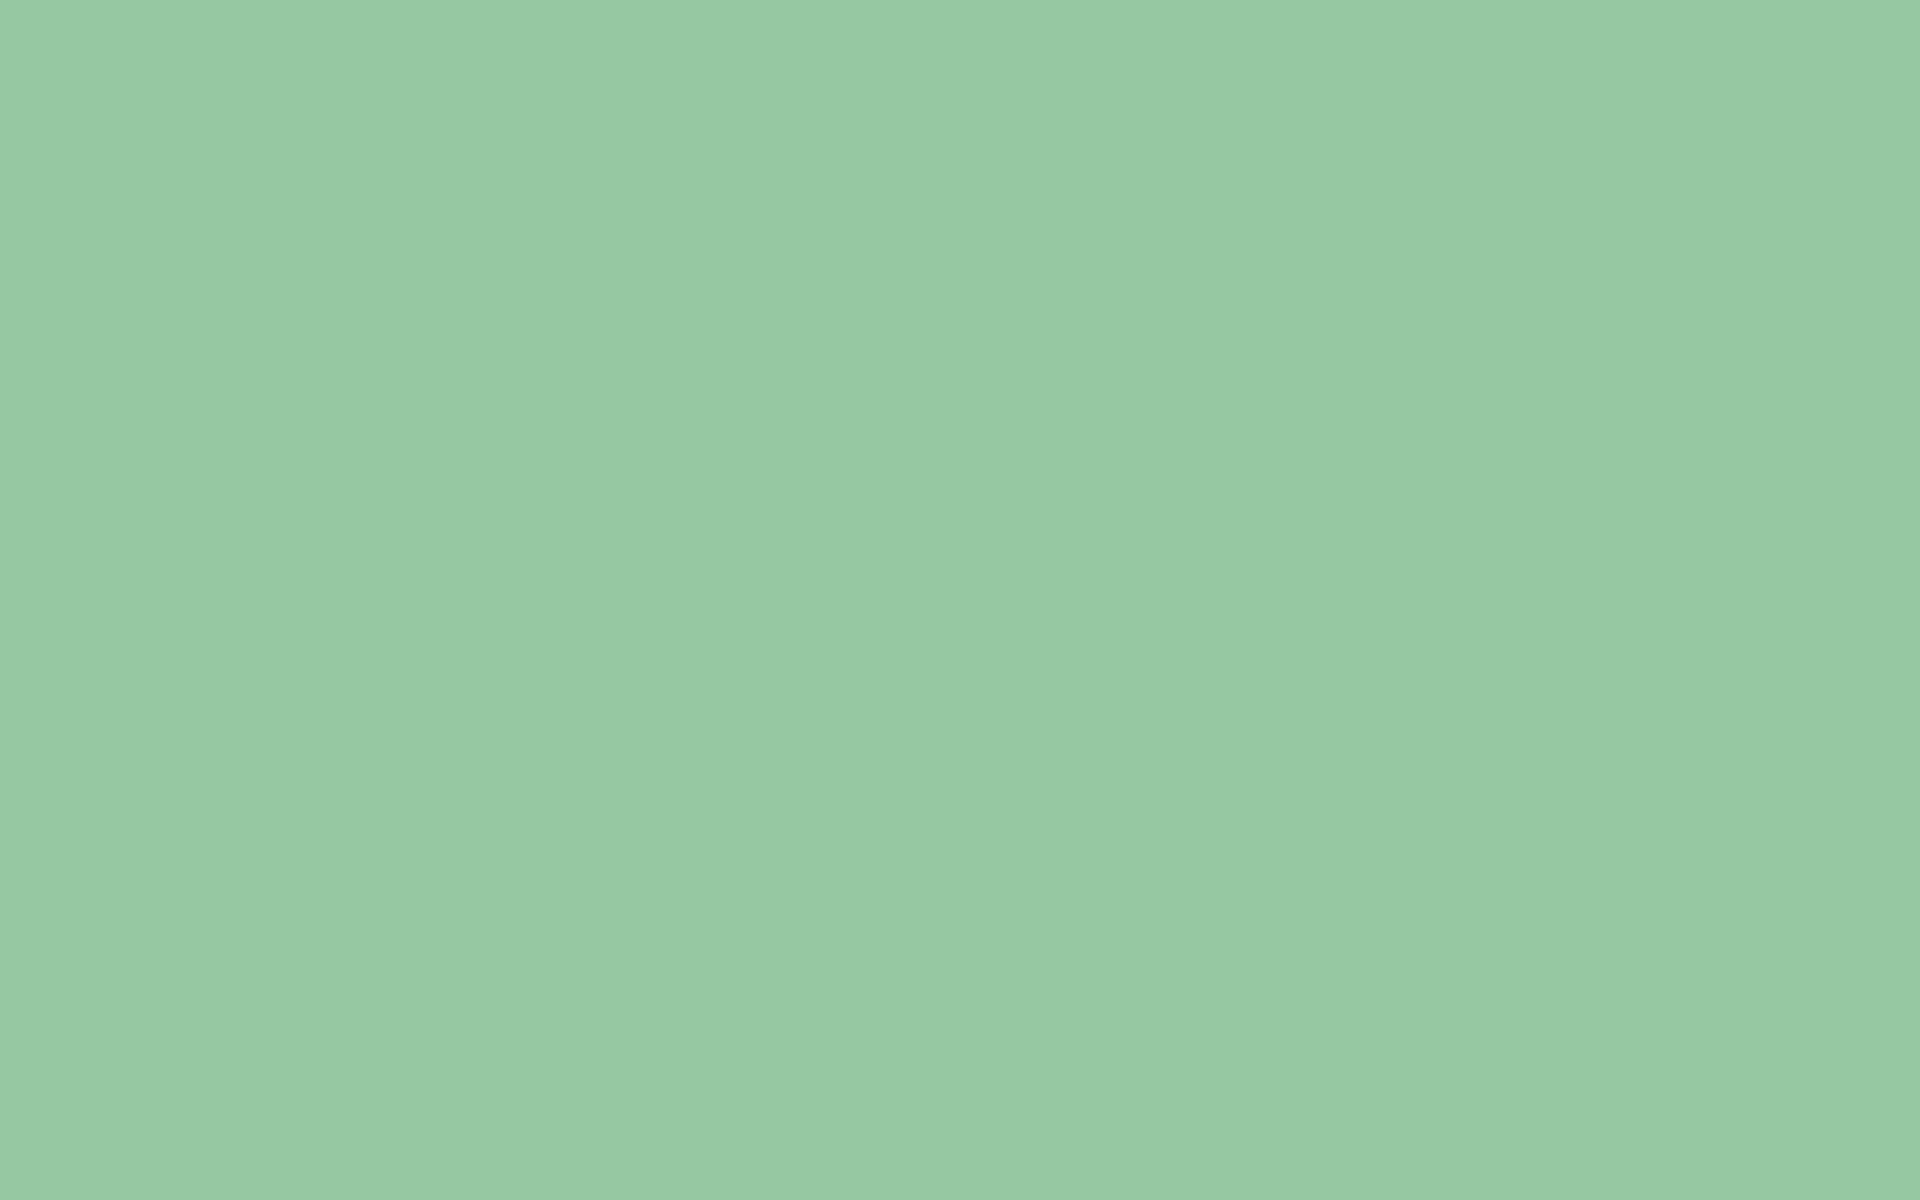 1920x1200 Eton Blue Solid Color Background